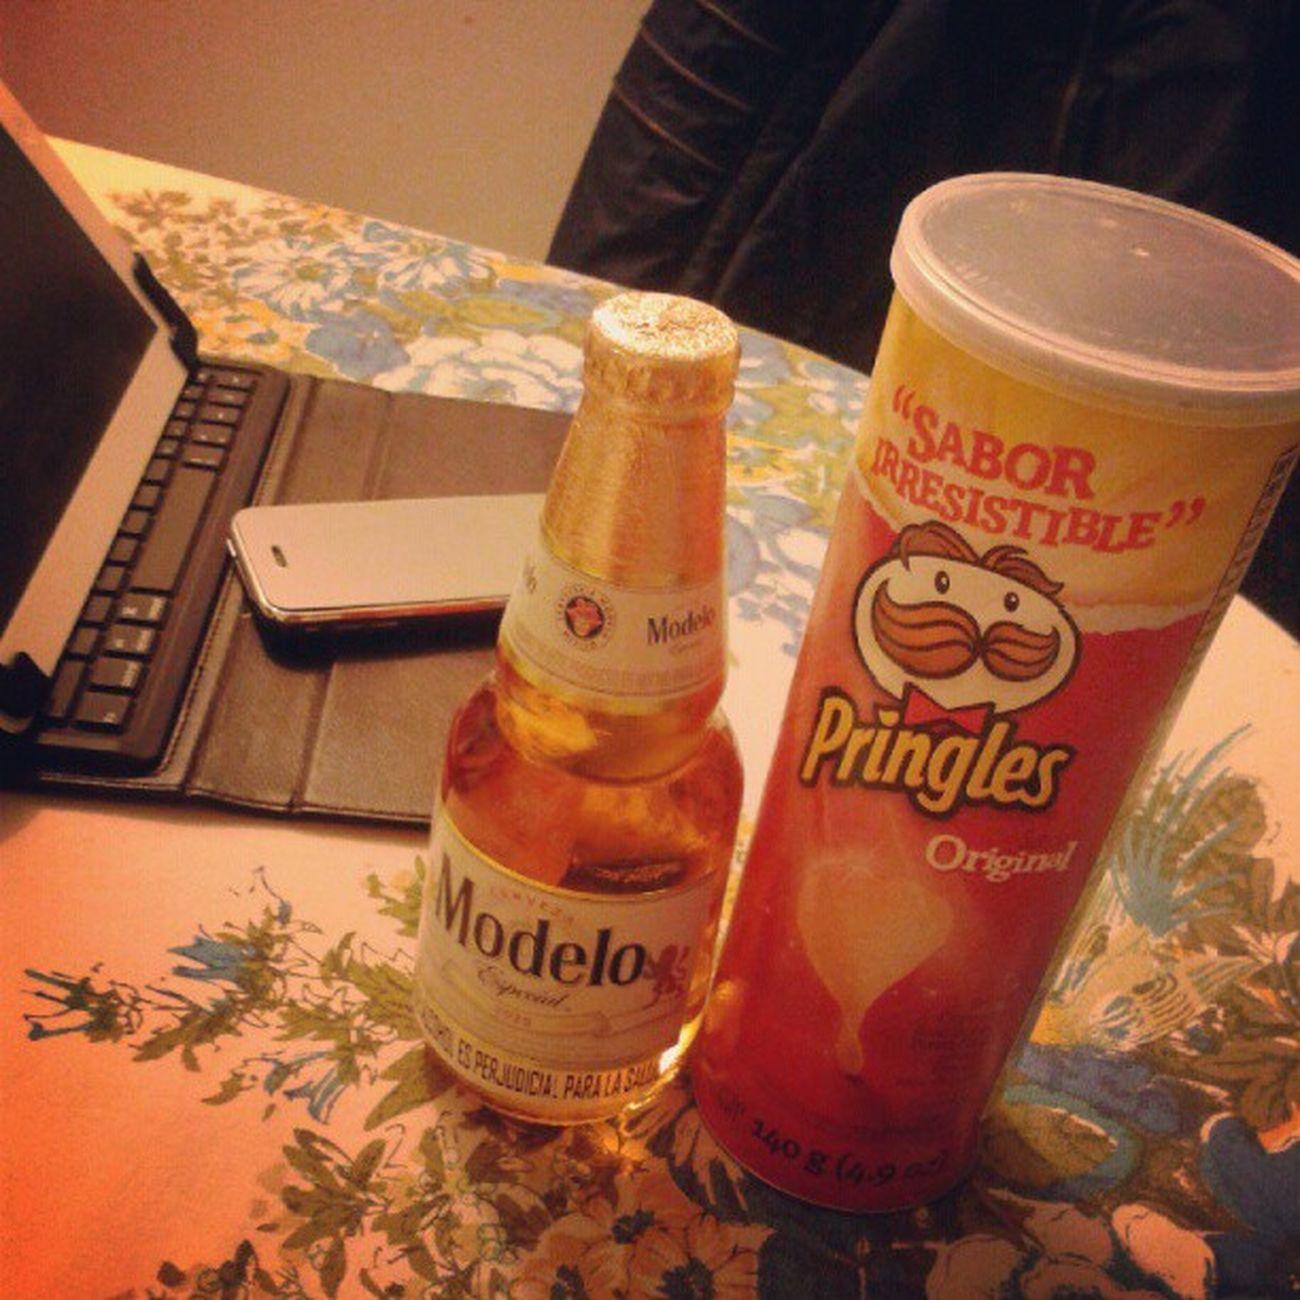 Básico Pringles ModeloEspecial ...